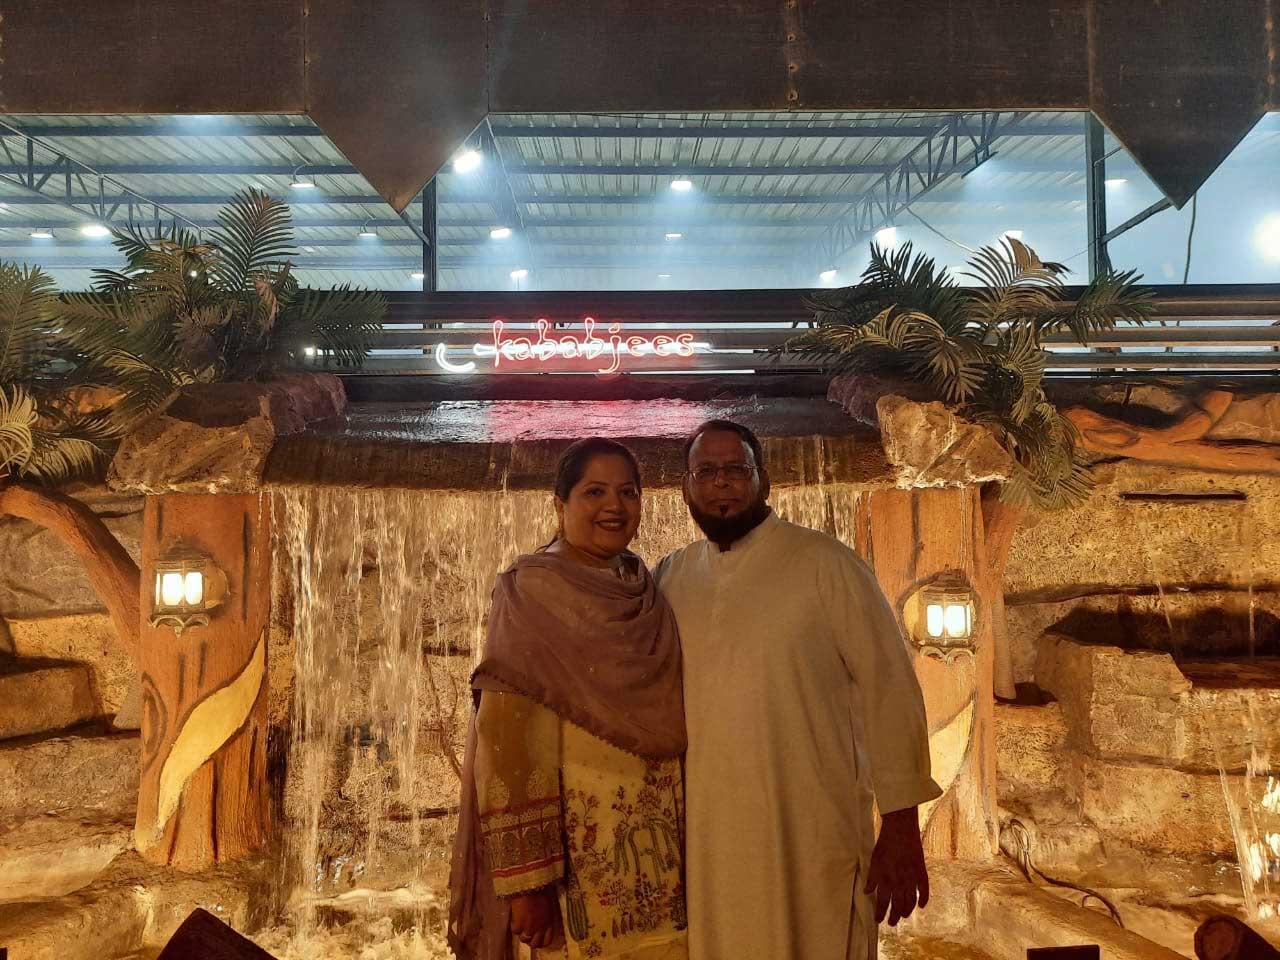 Dr. Kiran Ata Ur Rehman and Dr. Ata Ur Rehman